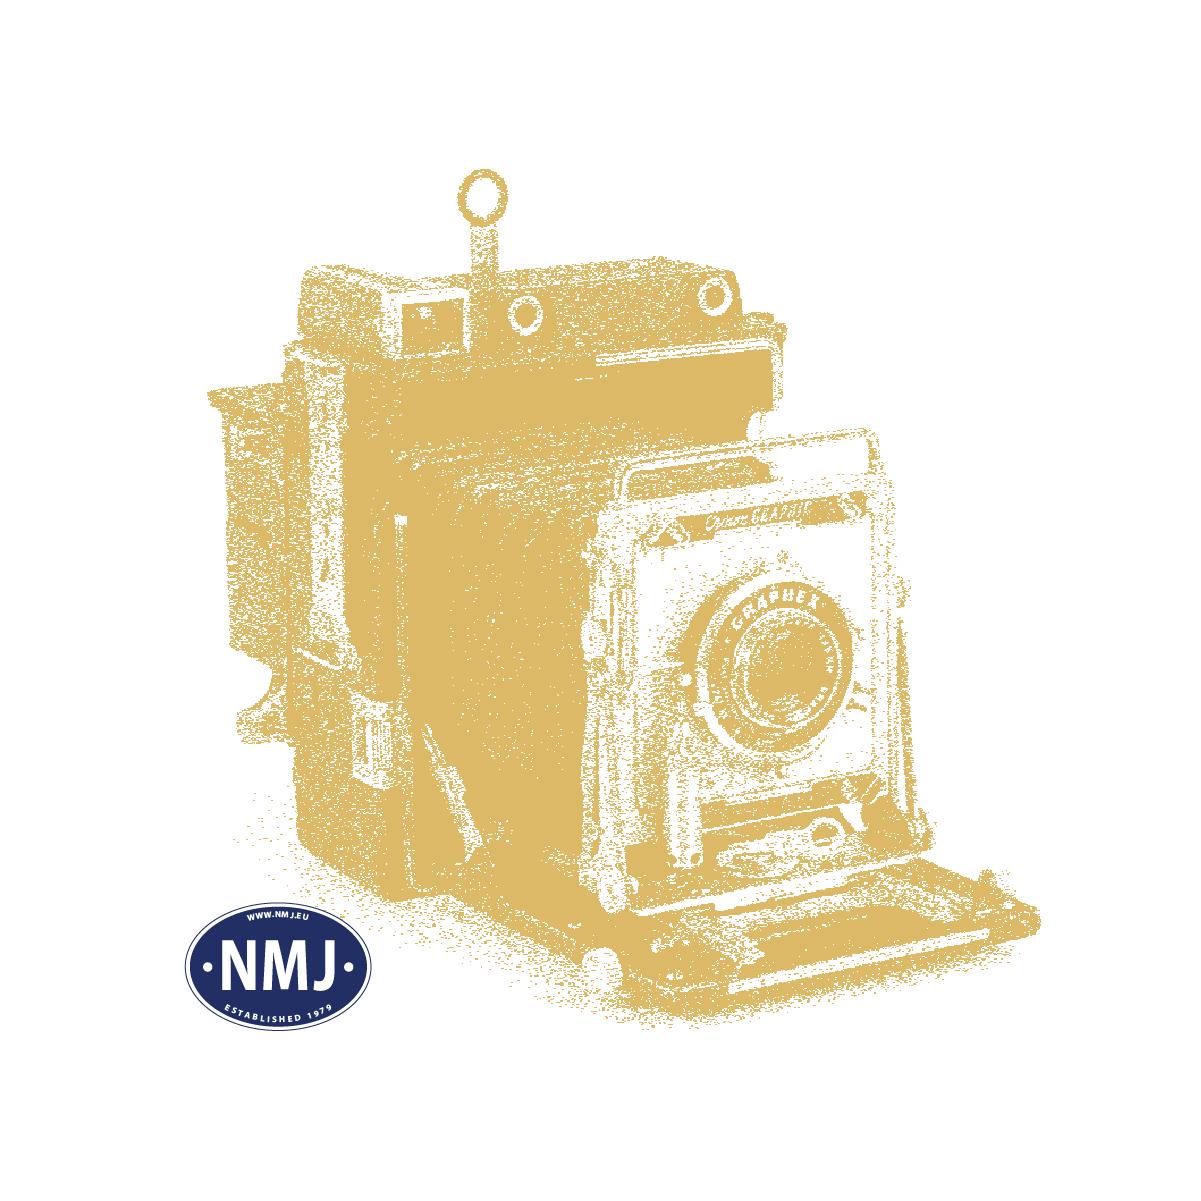 NMJT83.311 - NMJ Topline CargoNet Skd 224.213, Rot/gelb, DCC Digital